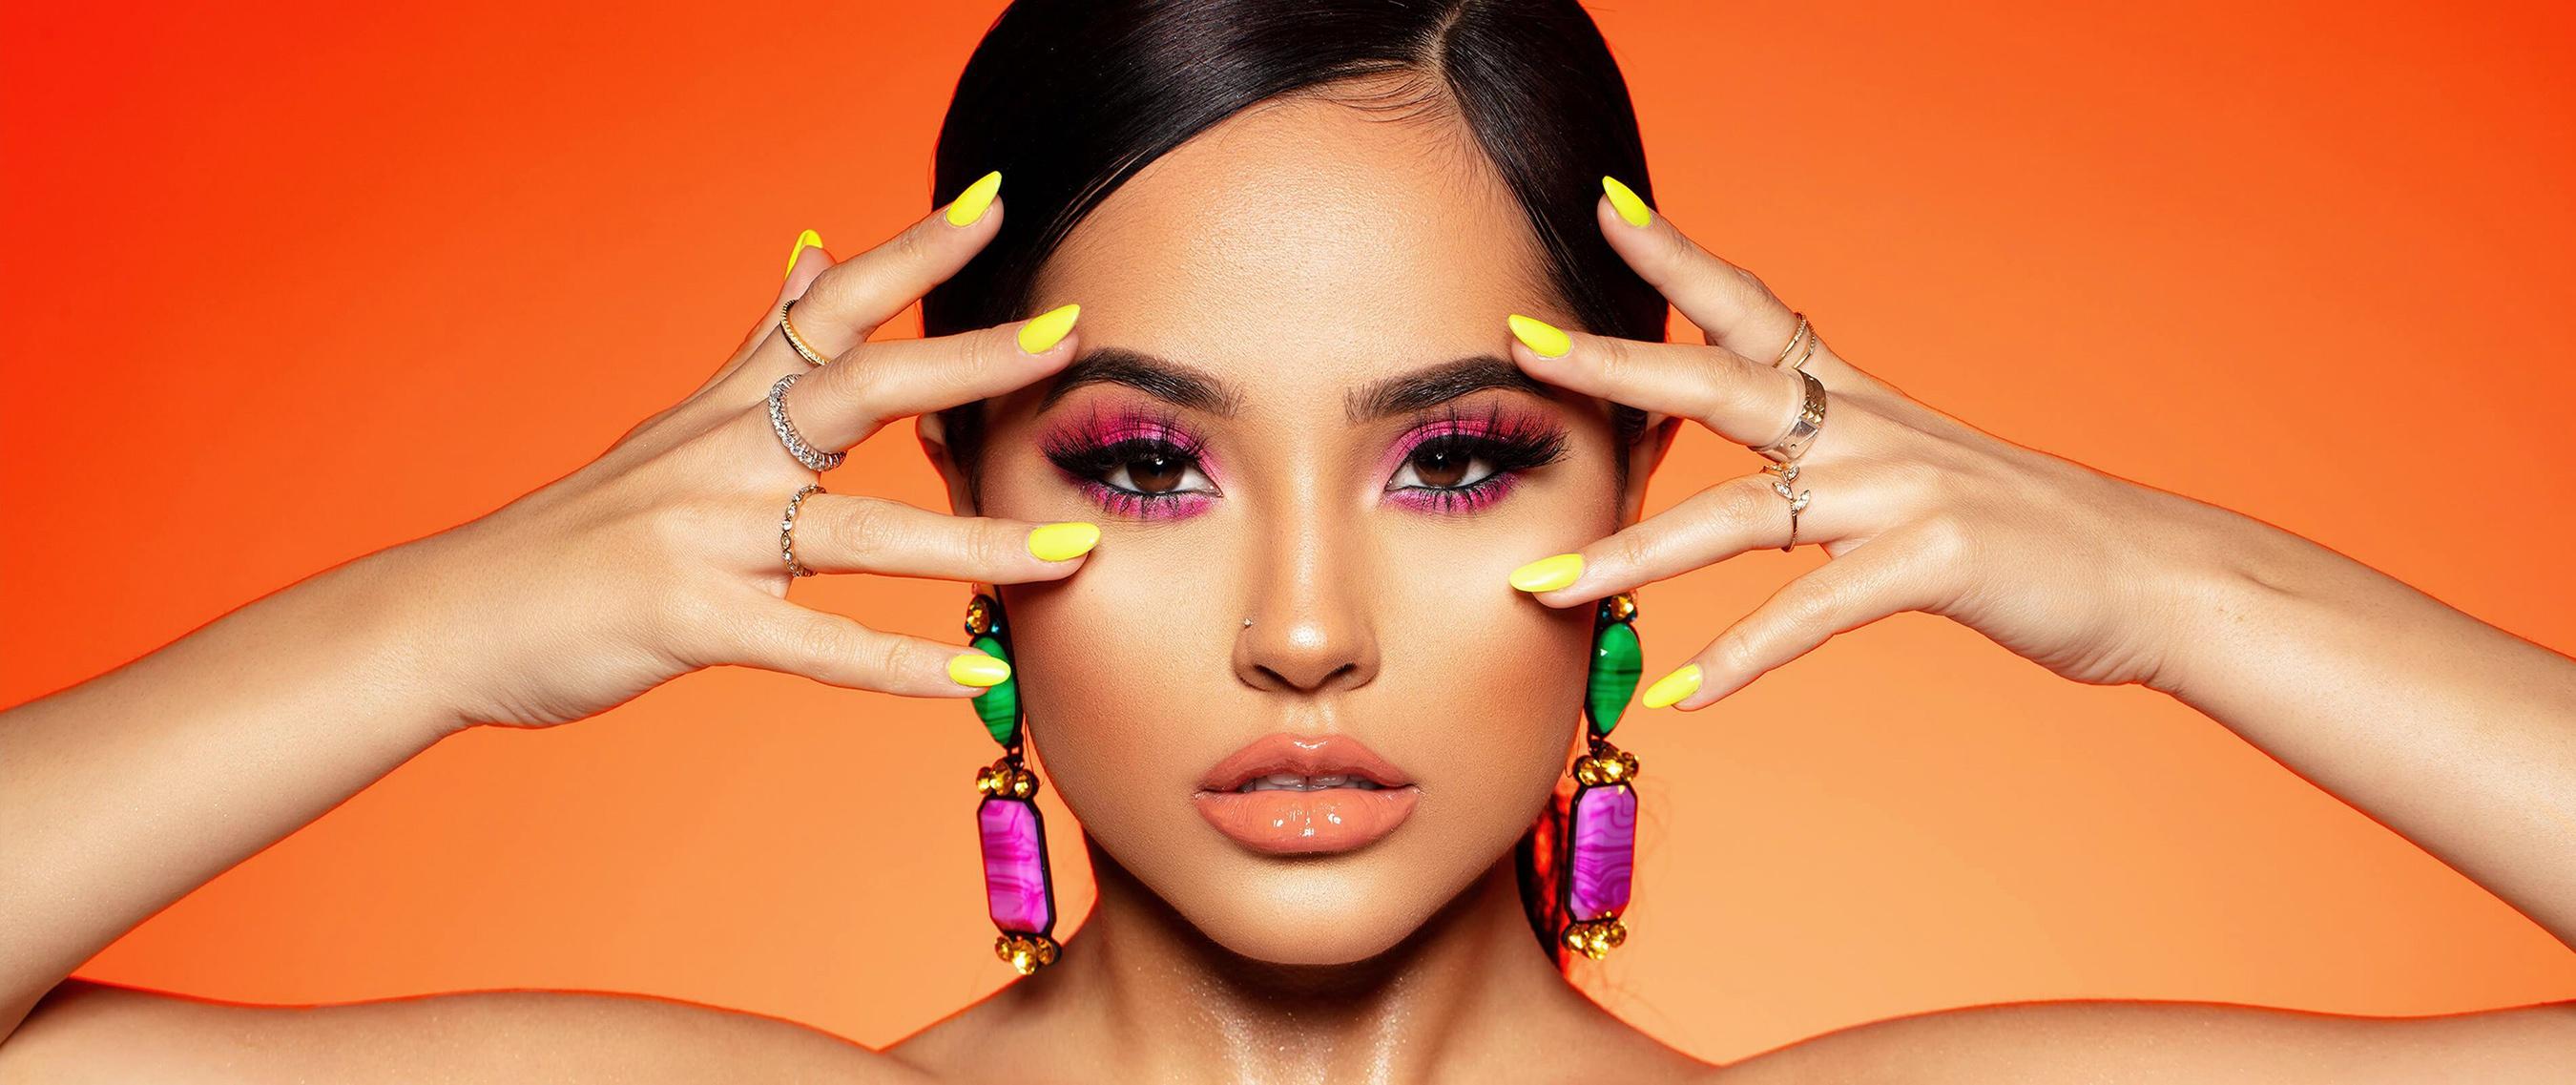 American Becky G Black Hair Brown Eyes Earrings Face Girl Makeup Singer 2700x1137